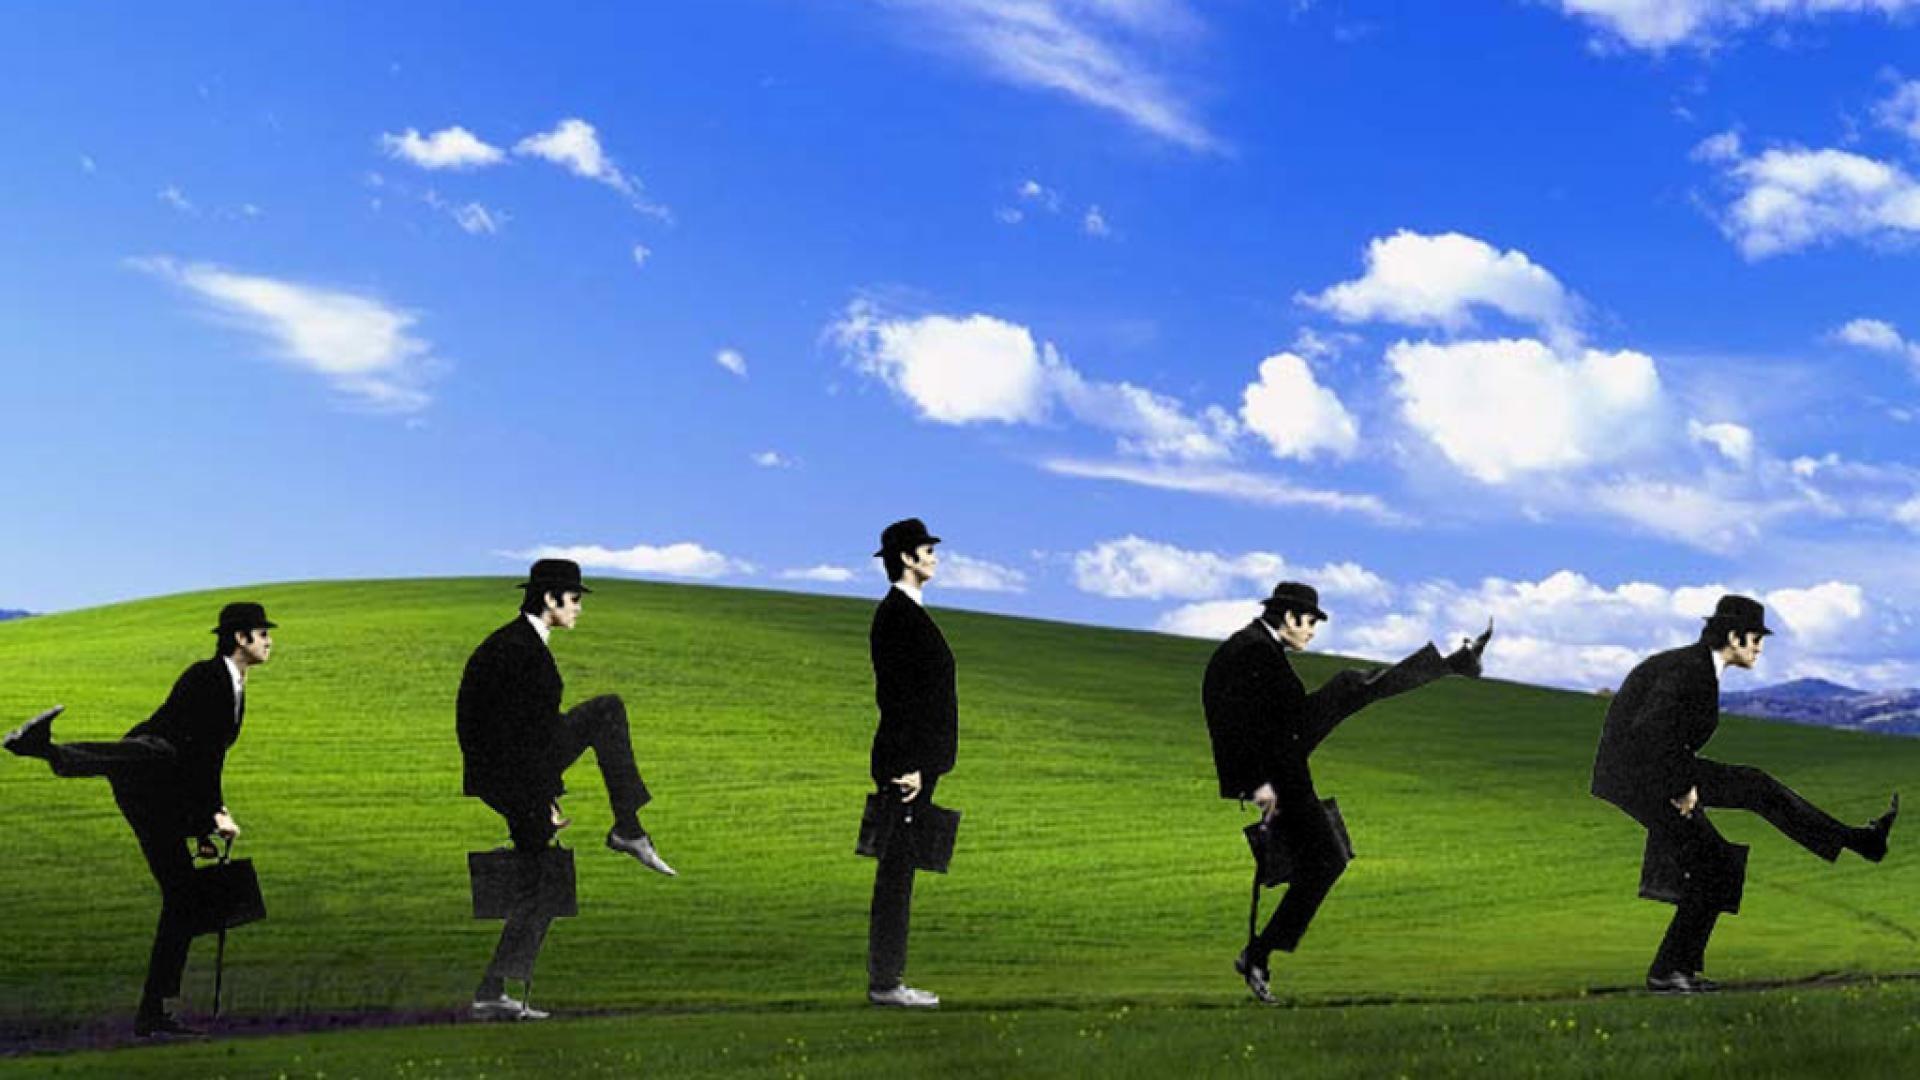 Microsoft windows monty python windows xp silly walk wallpaper .